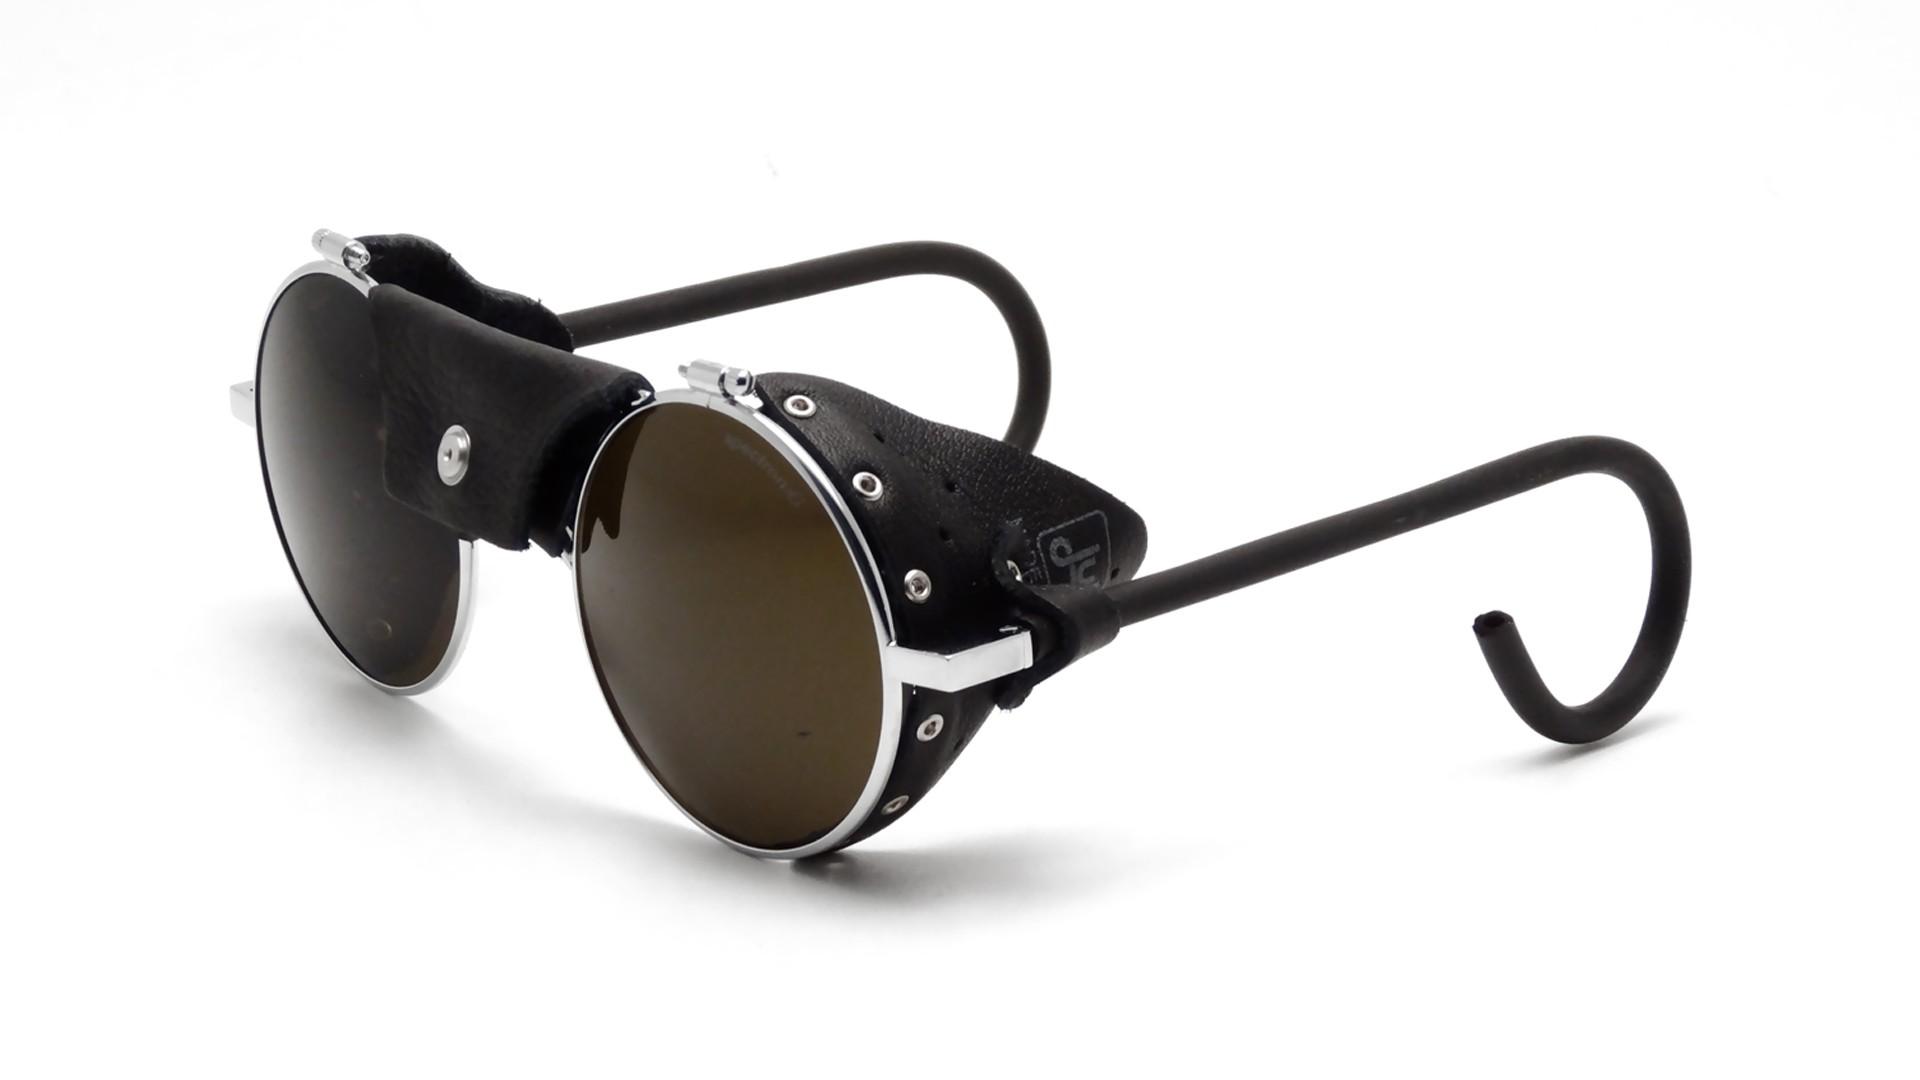 Julbo VERMONT CLASSIC J01020125 51 New Men Sunglasses